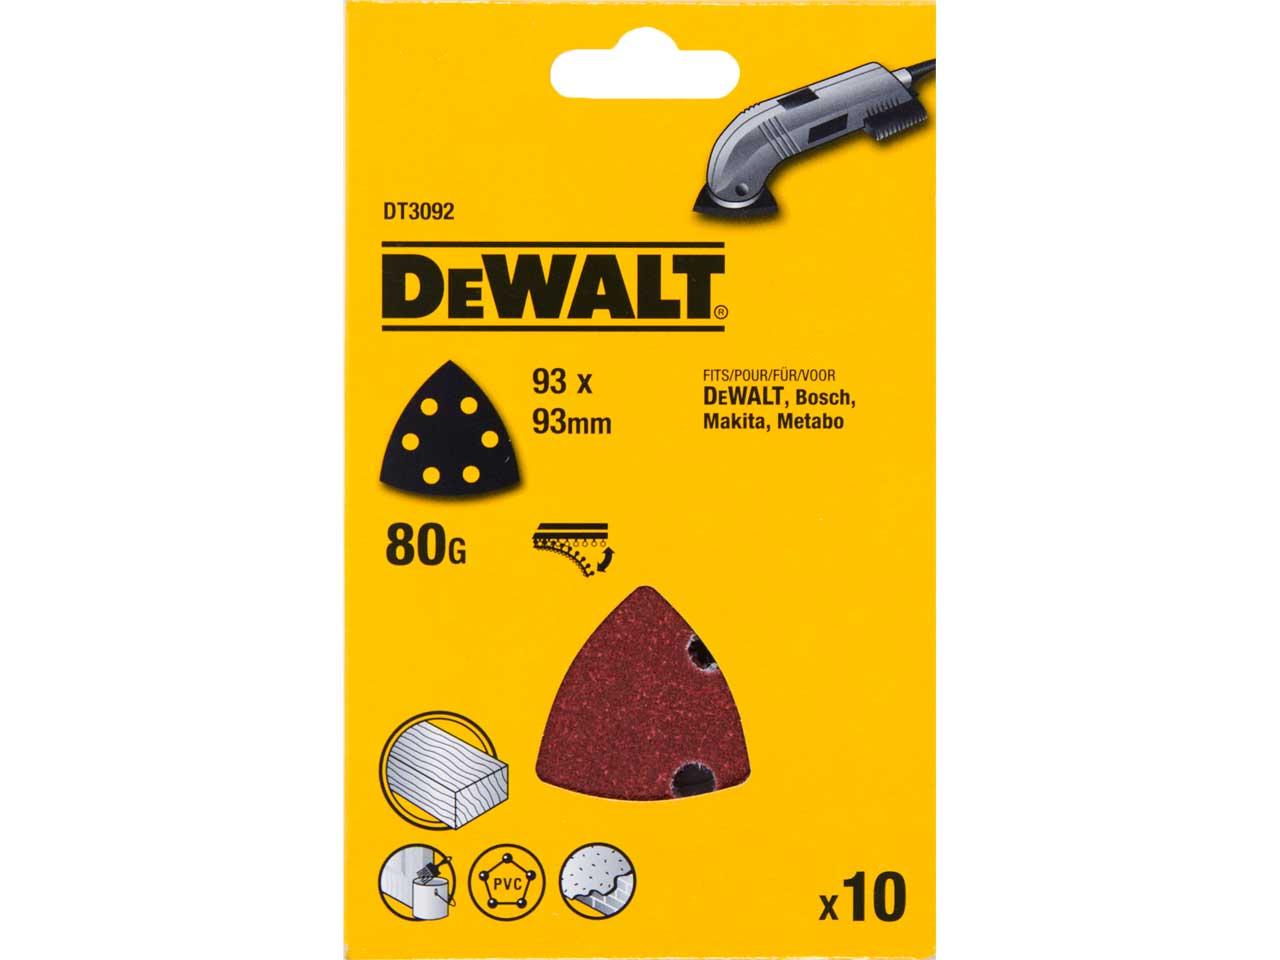 DeWalt_DT3092-QZ.jpg